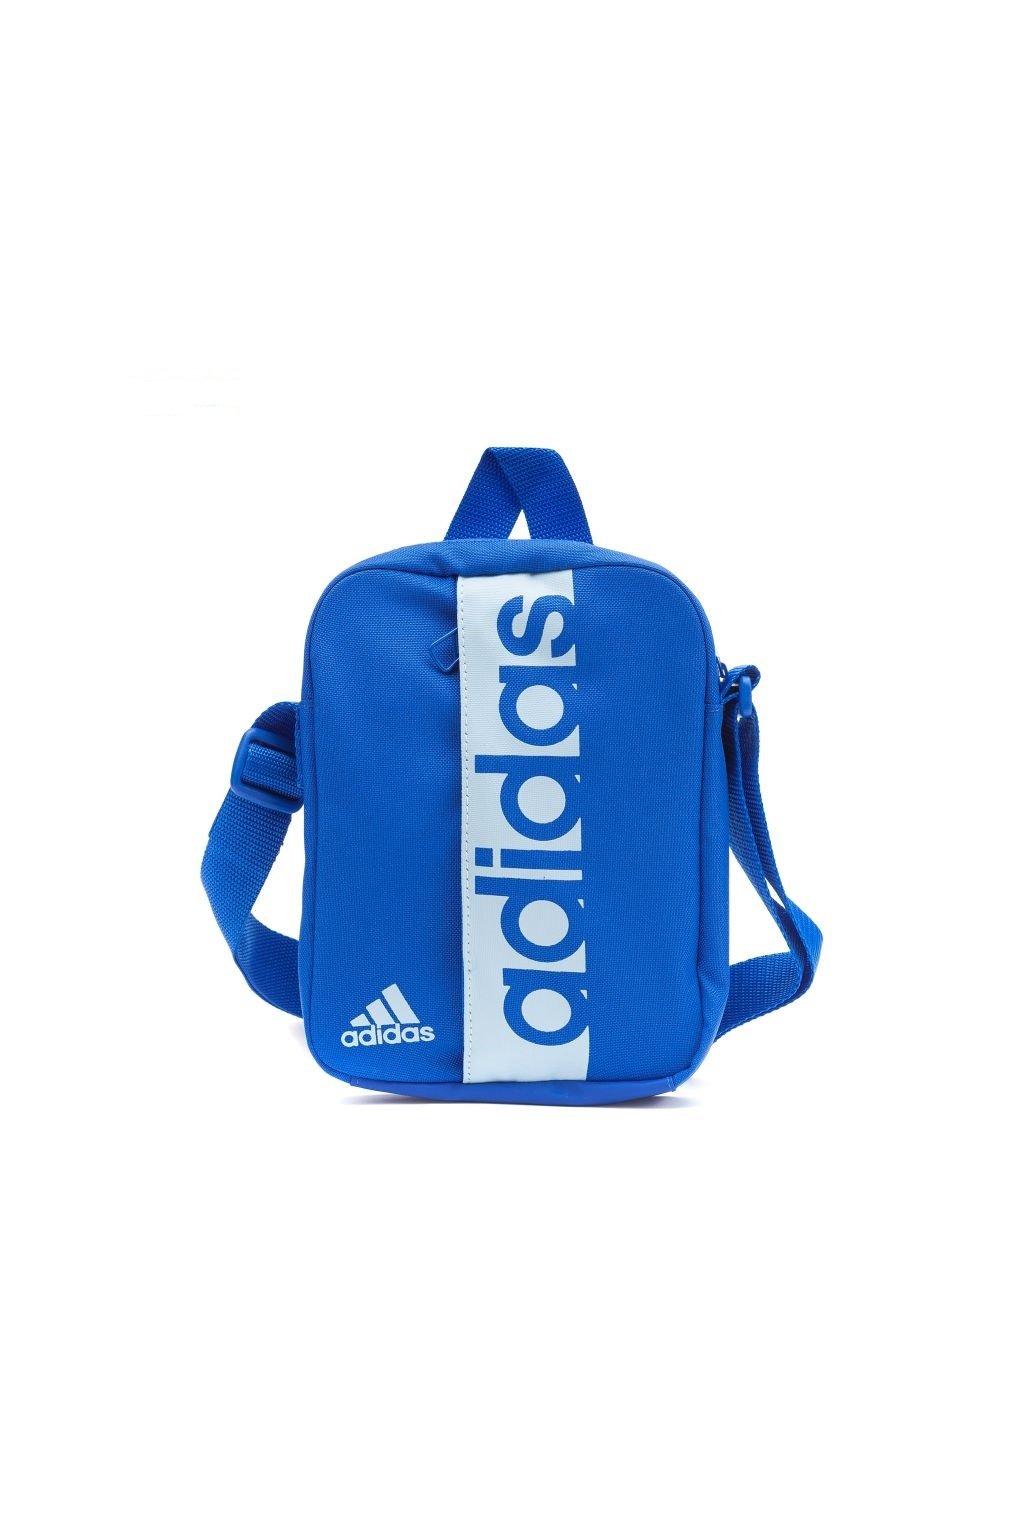 7a2cf8992a Športová taška Adidas - CF5009 - Fresh sport